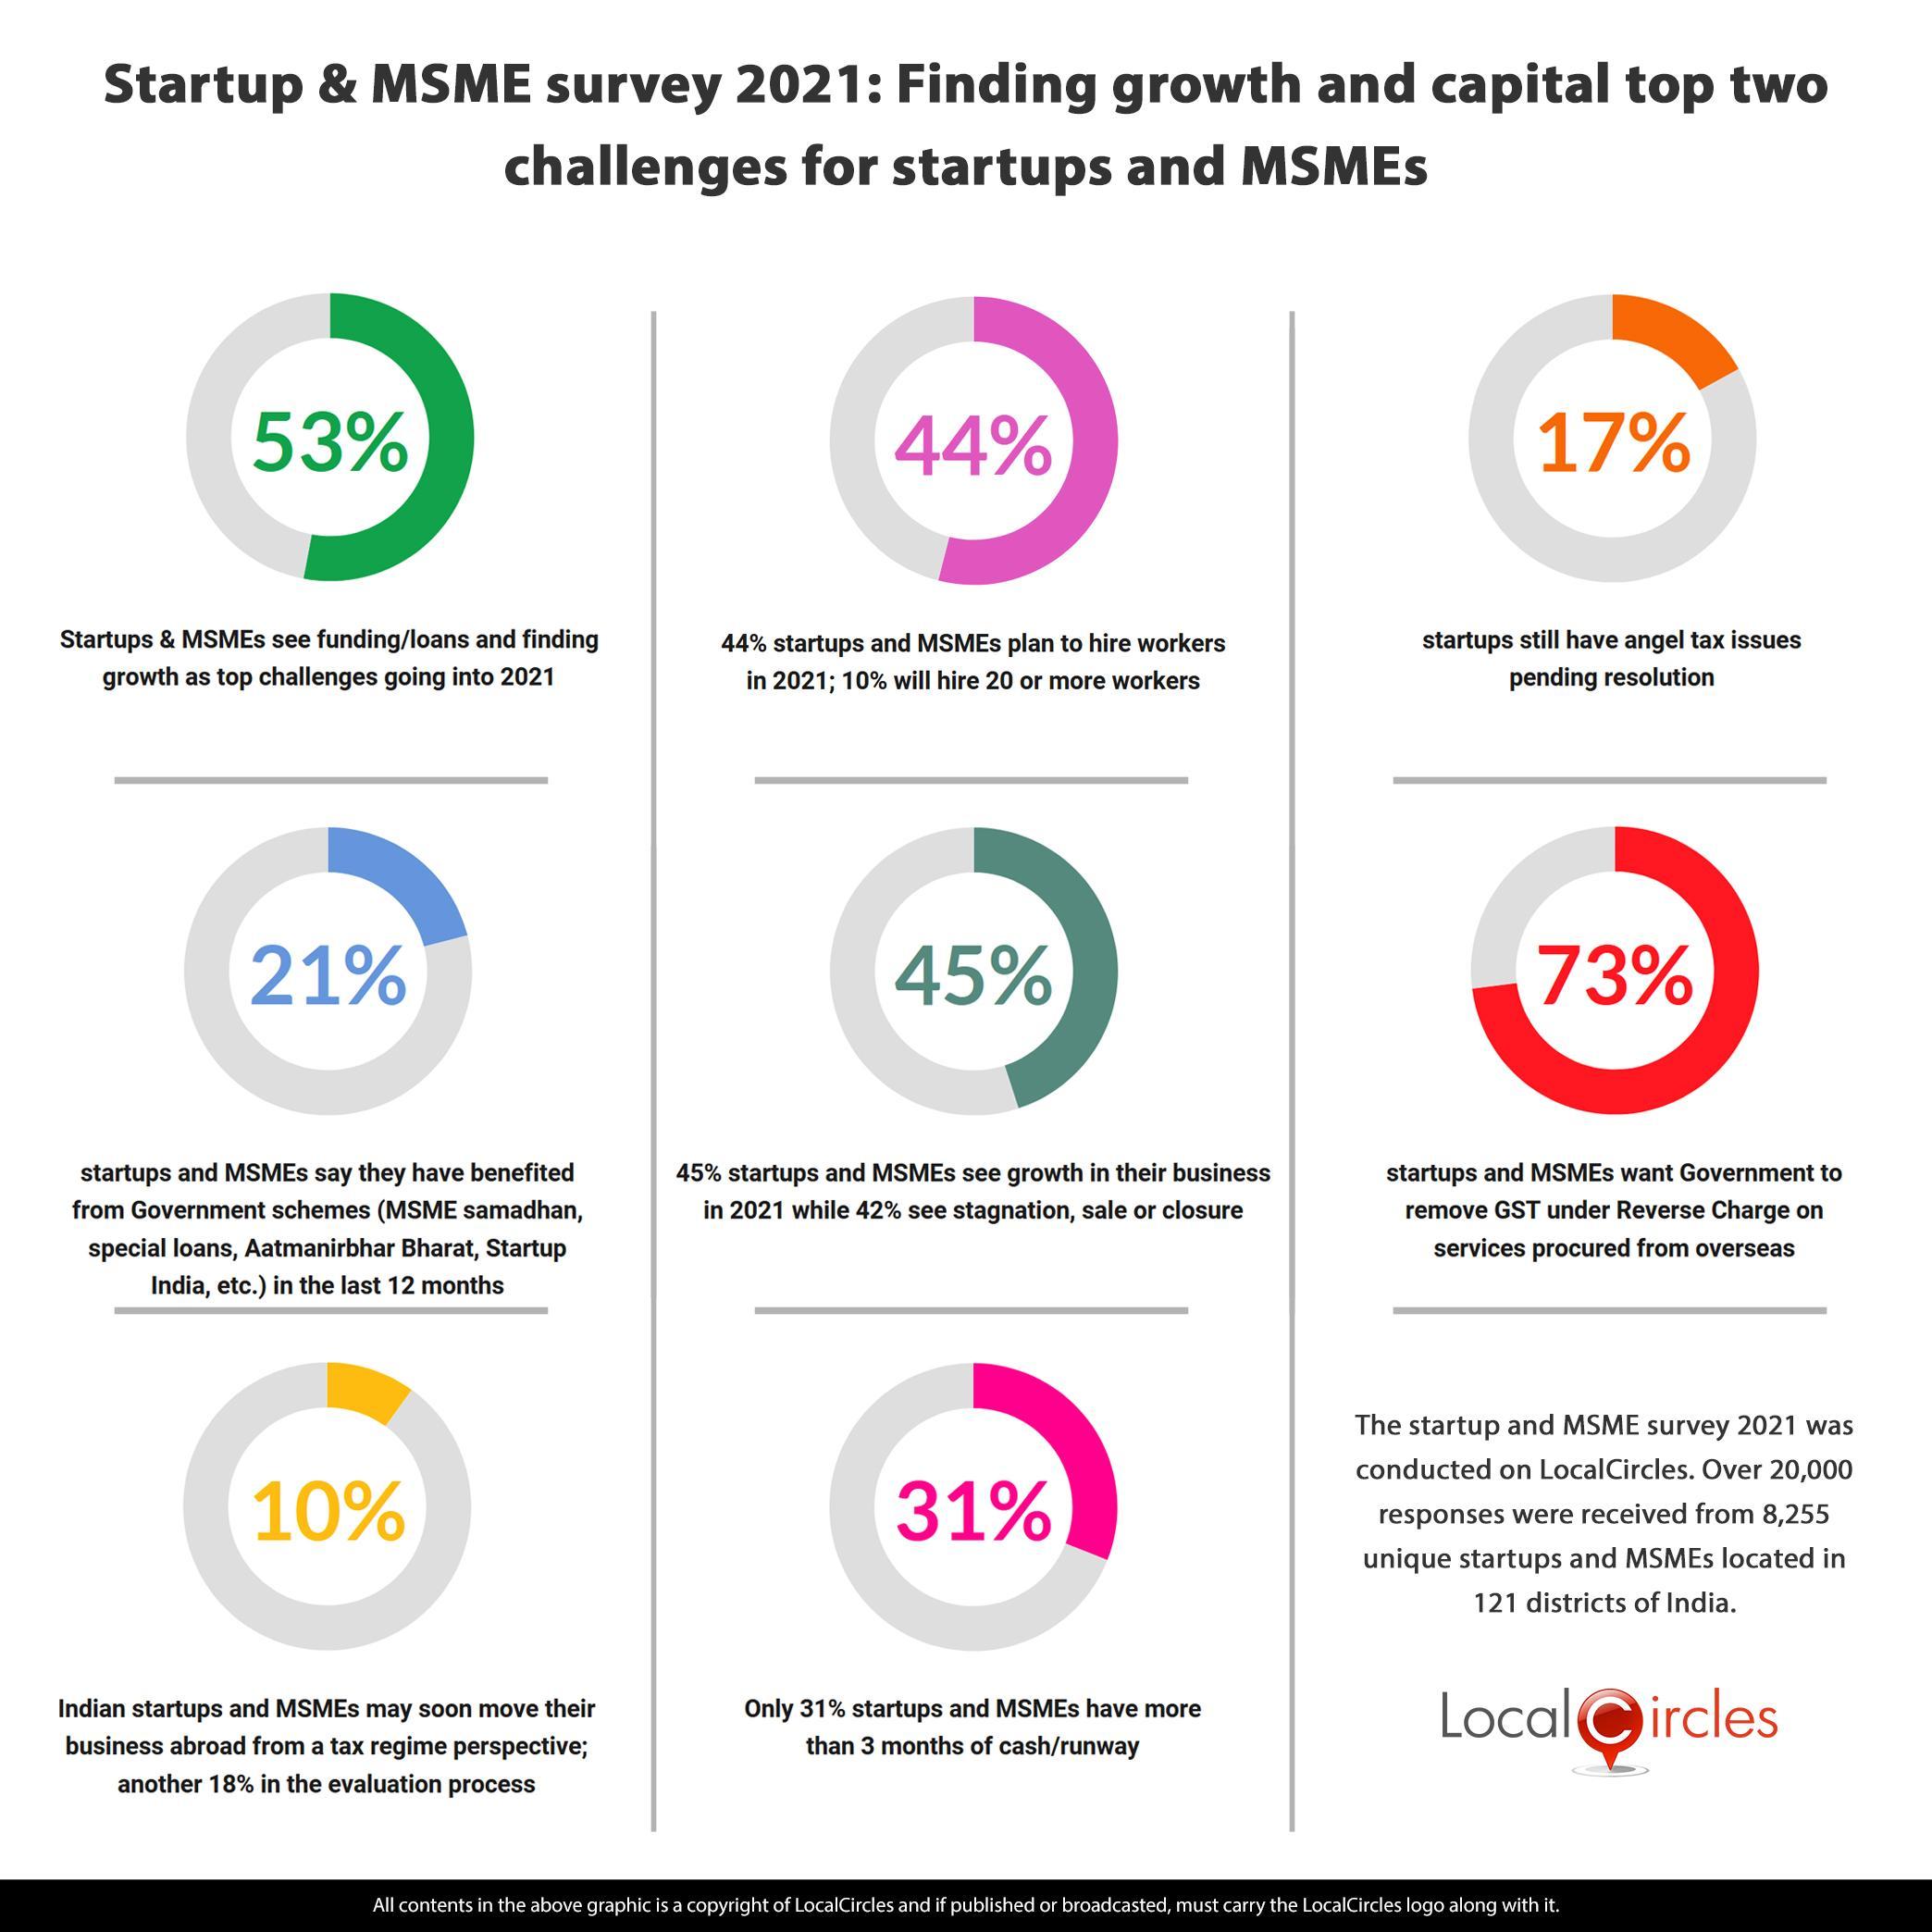 via_LocalCircles_New_Startup_Polls_-_17_Dec_2020_-_Summary___20210122114531___.jpg